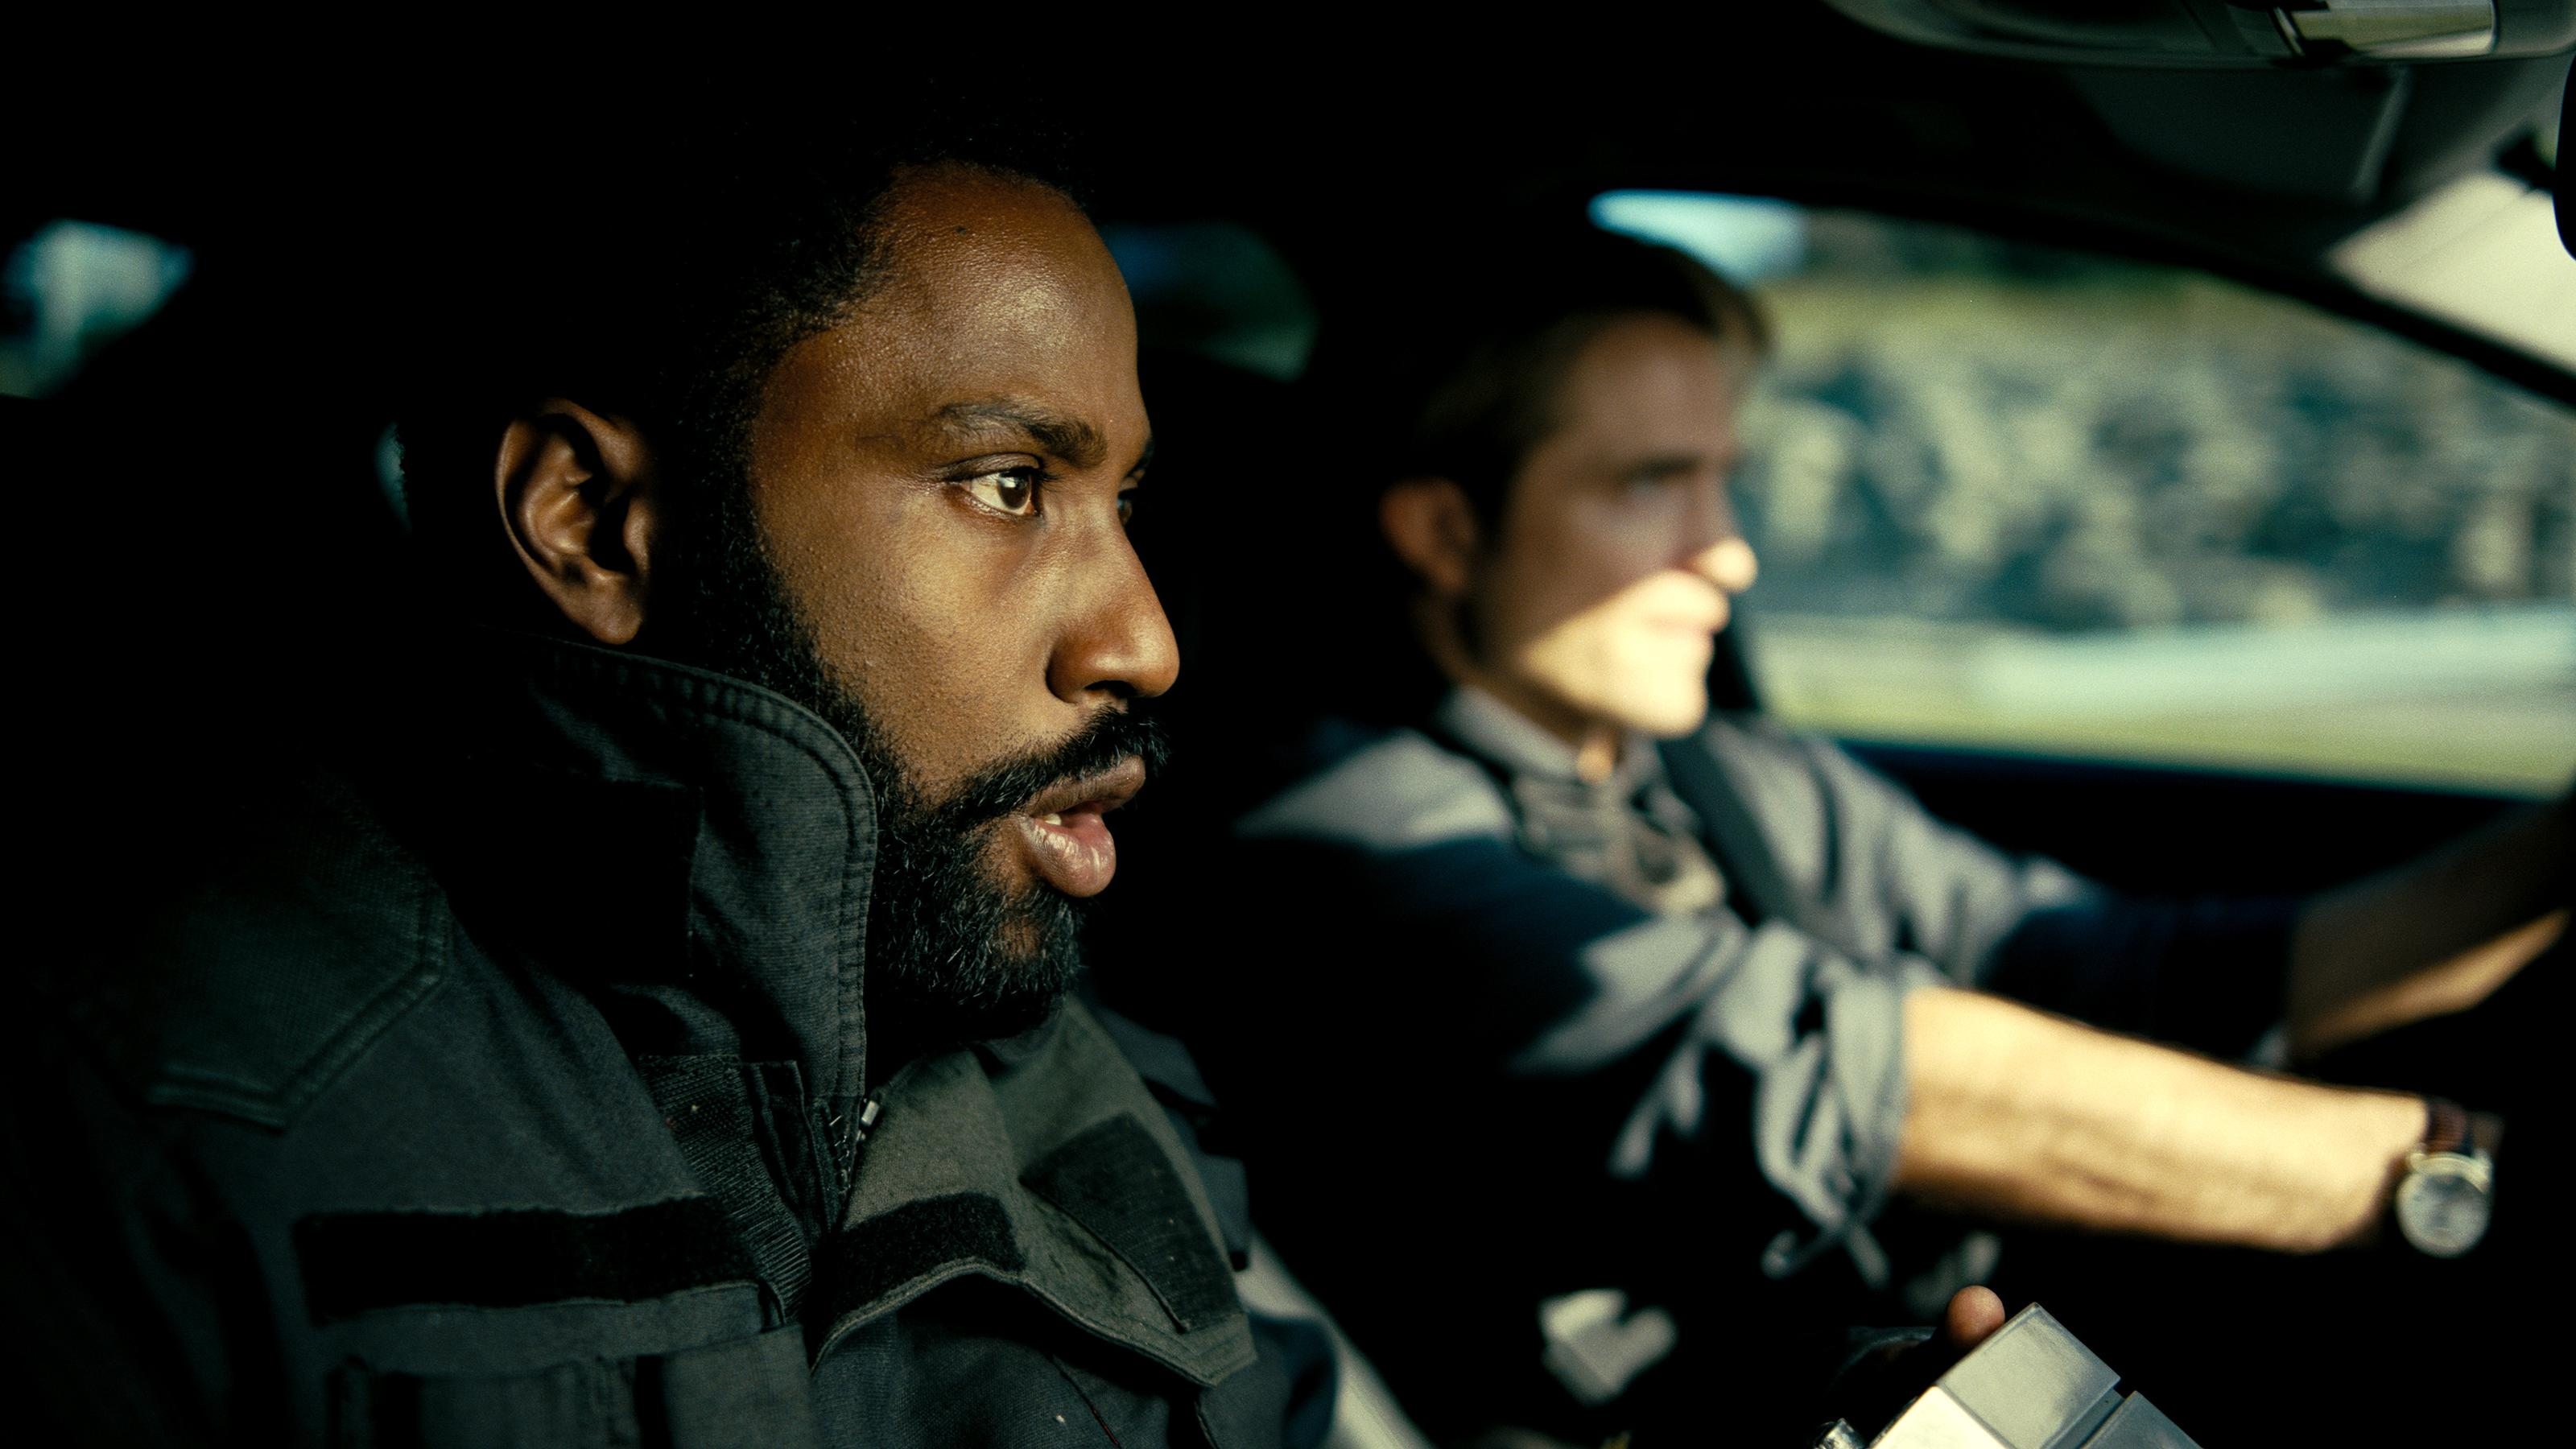 John David Washington and Robert Pattinson in Chris Nolan's 'Tenet'